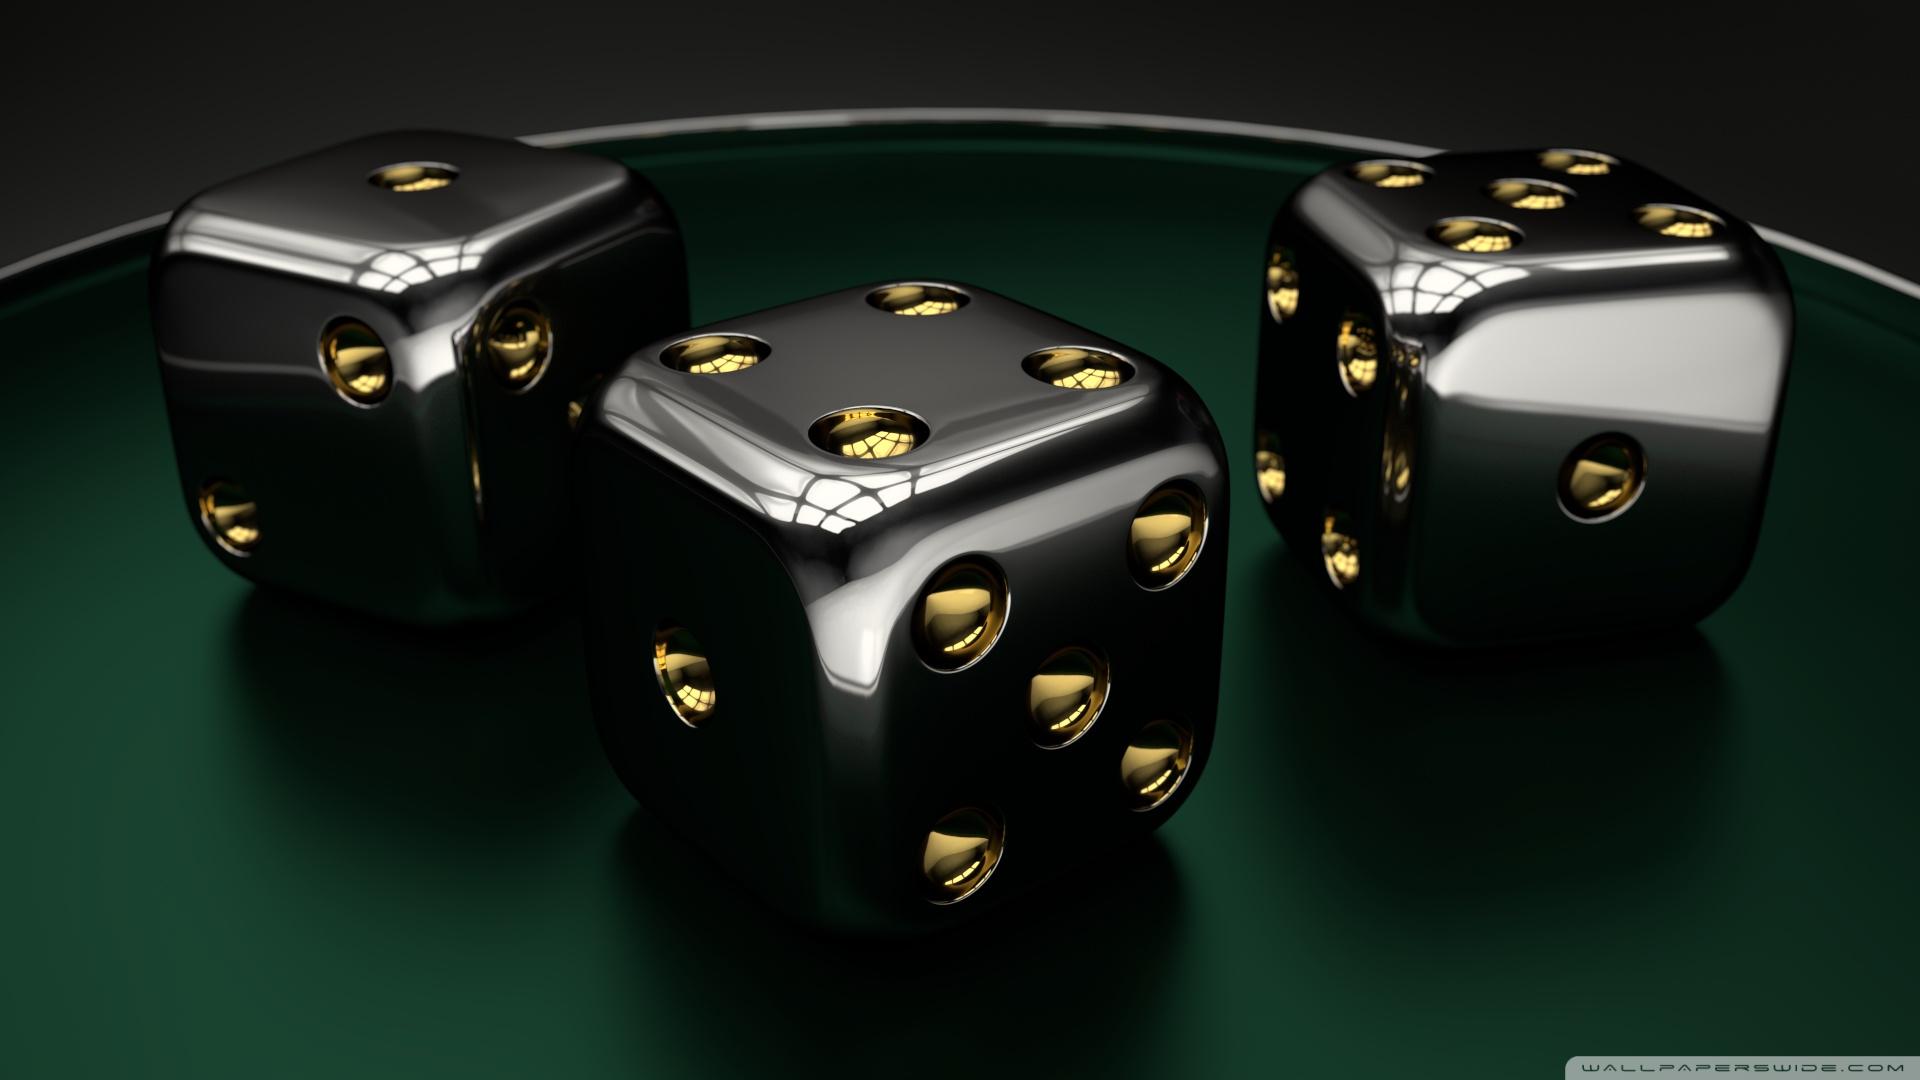 3d dice 04 ❤ uhd desktop wallpaper for ultra hd 4k 8k